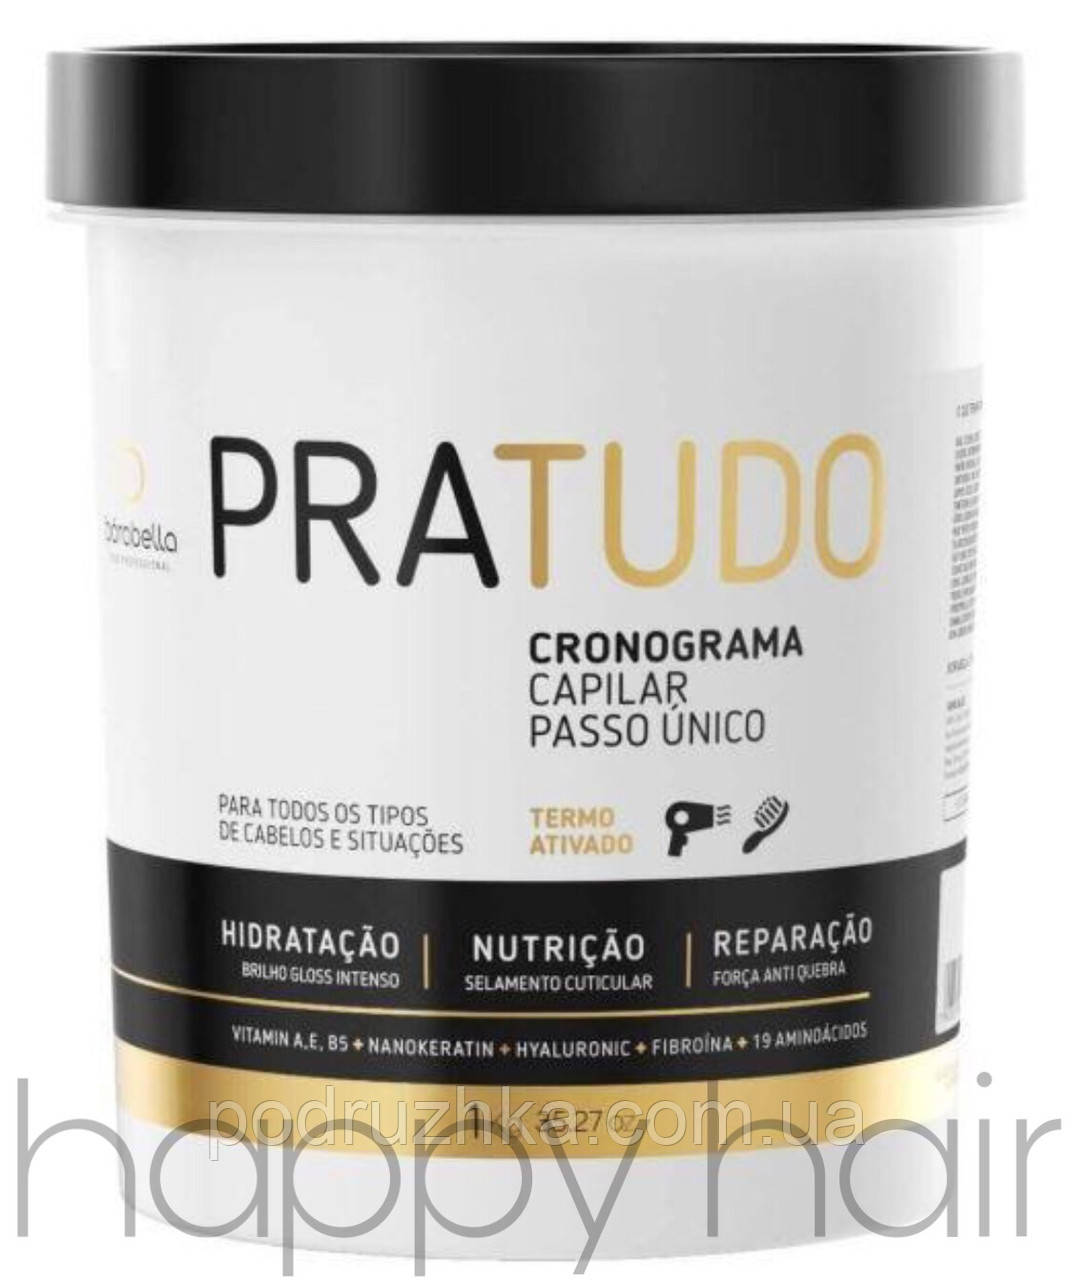 Borabella Pra Tudo Cronograma Capilar ботекс для волос 500 г